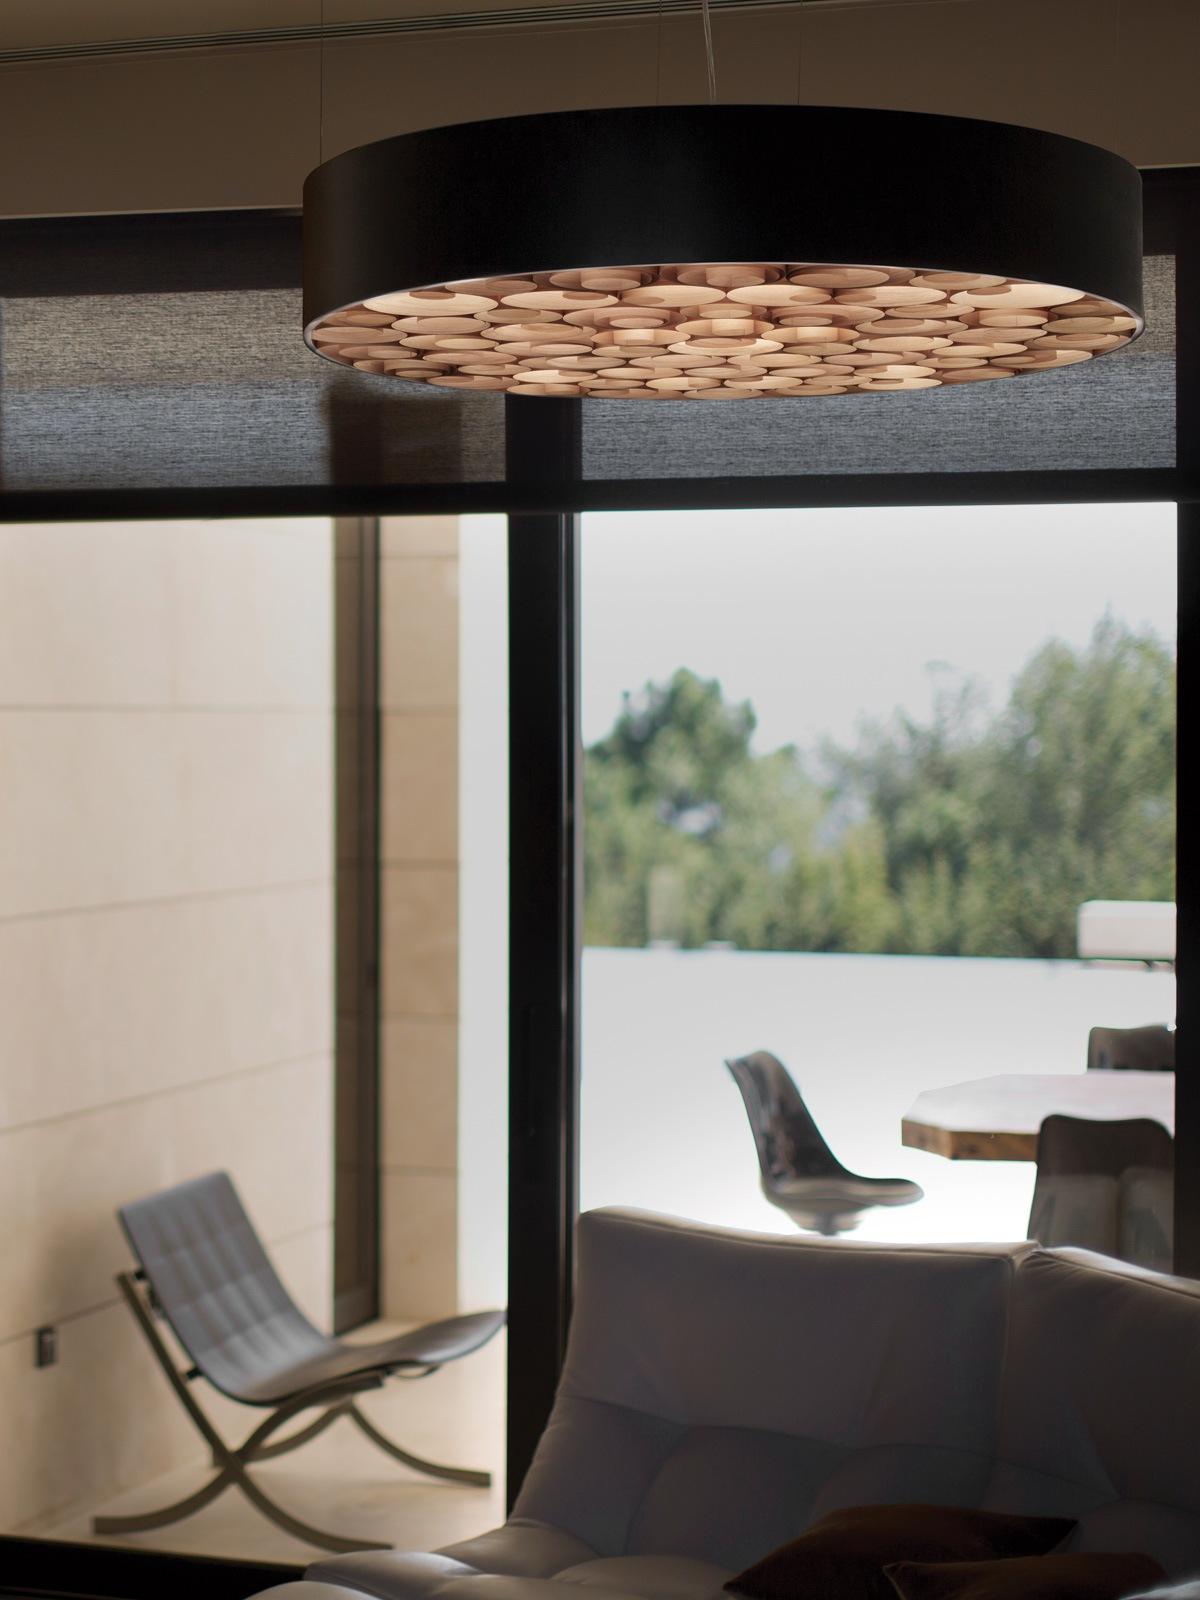 LZF Lamps Spiro Black große Pendelleuchte aus Holz DeisgnOrt Lampen Berlin